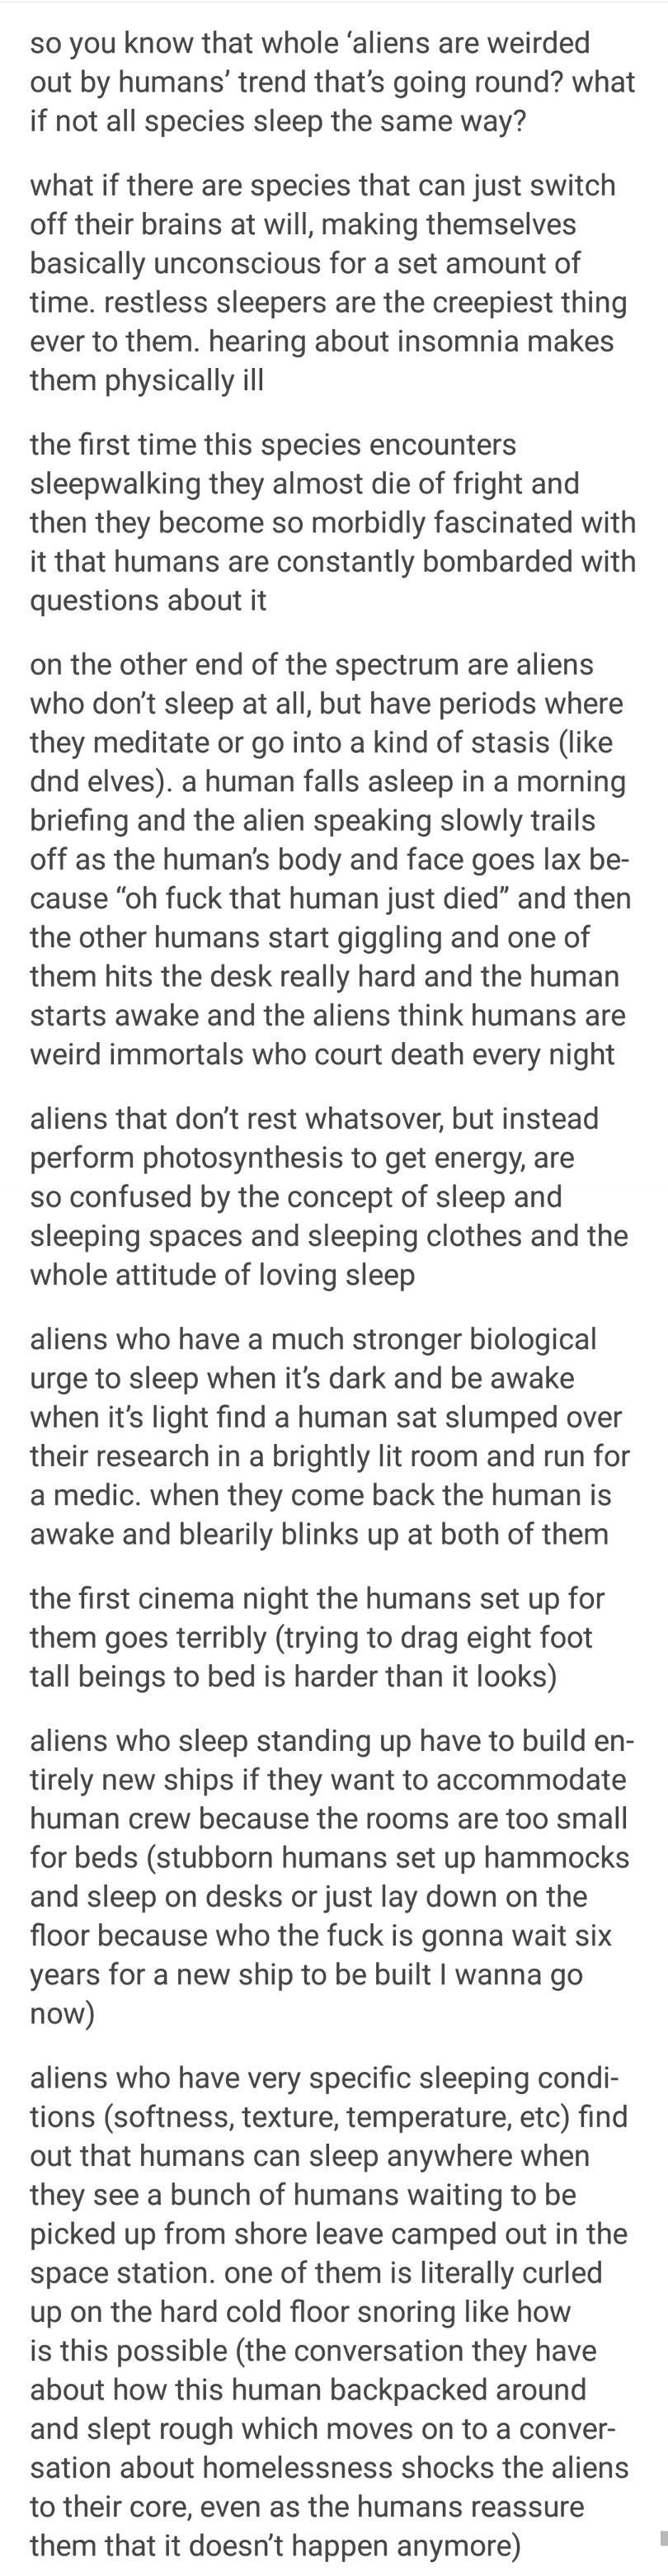 My strange dream   Last night I had a dream